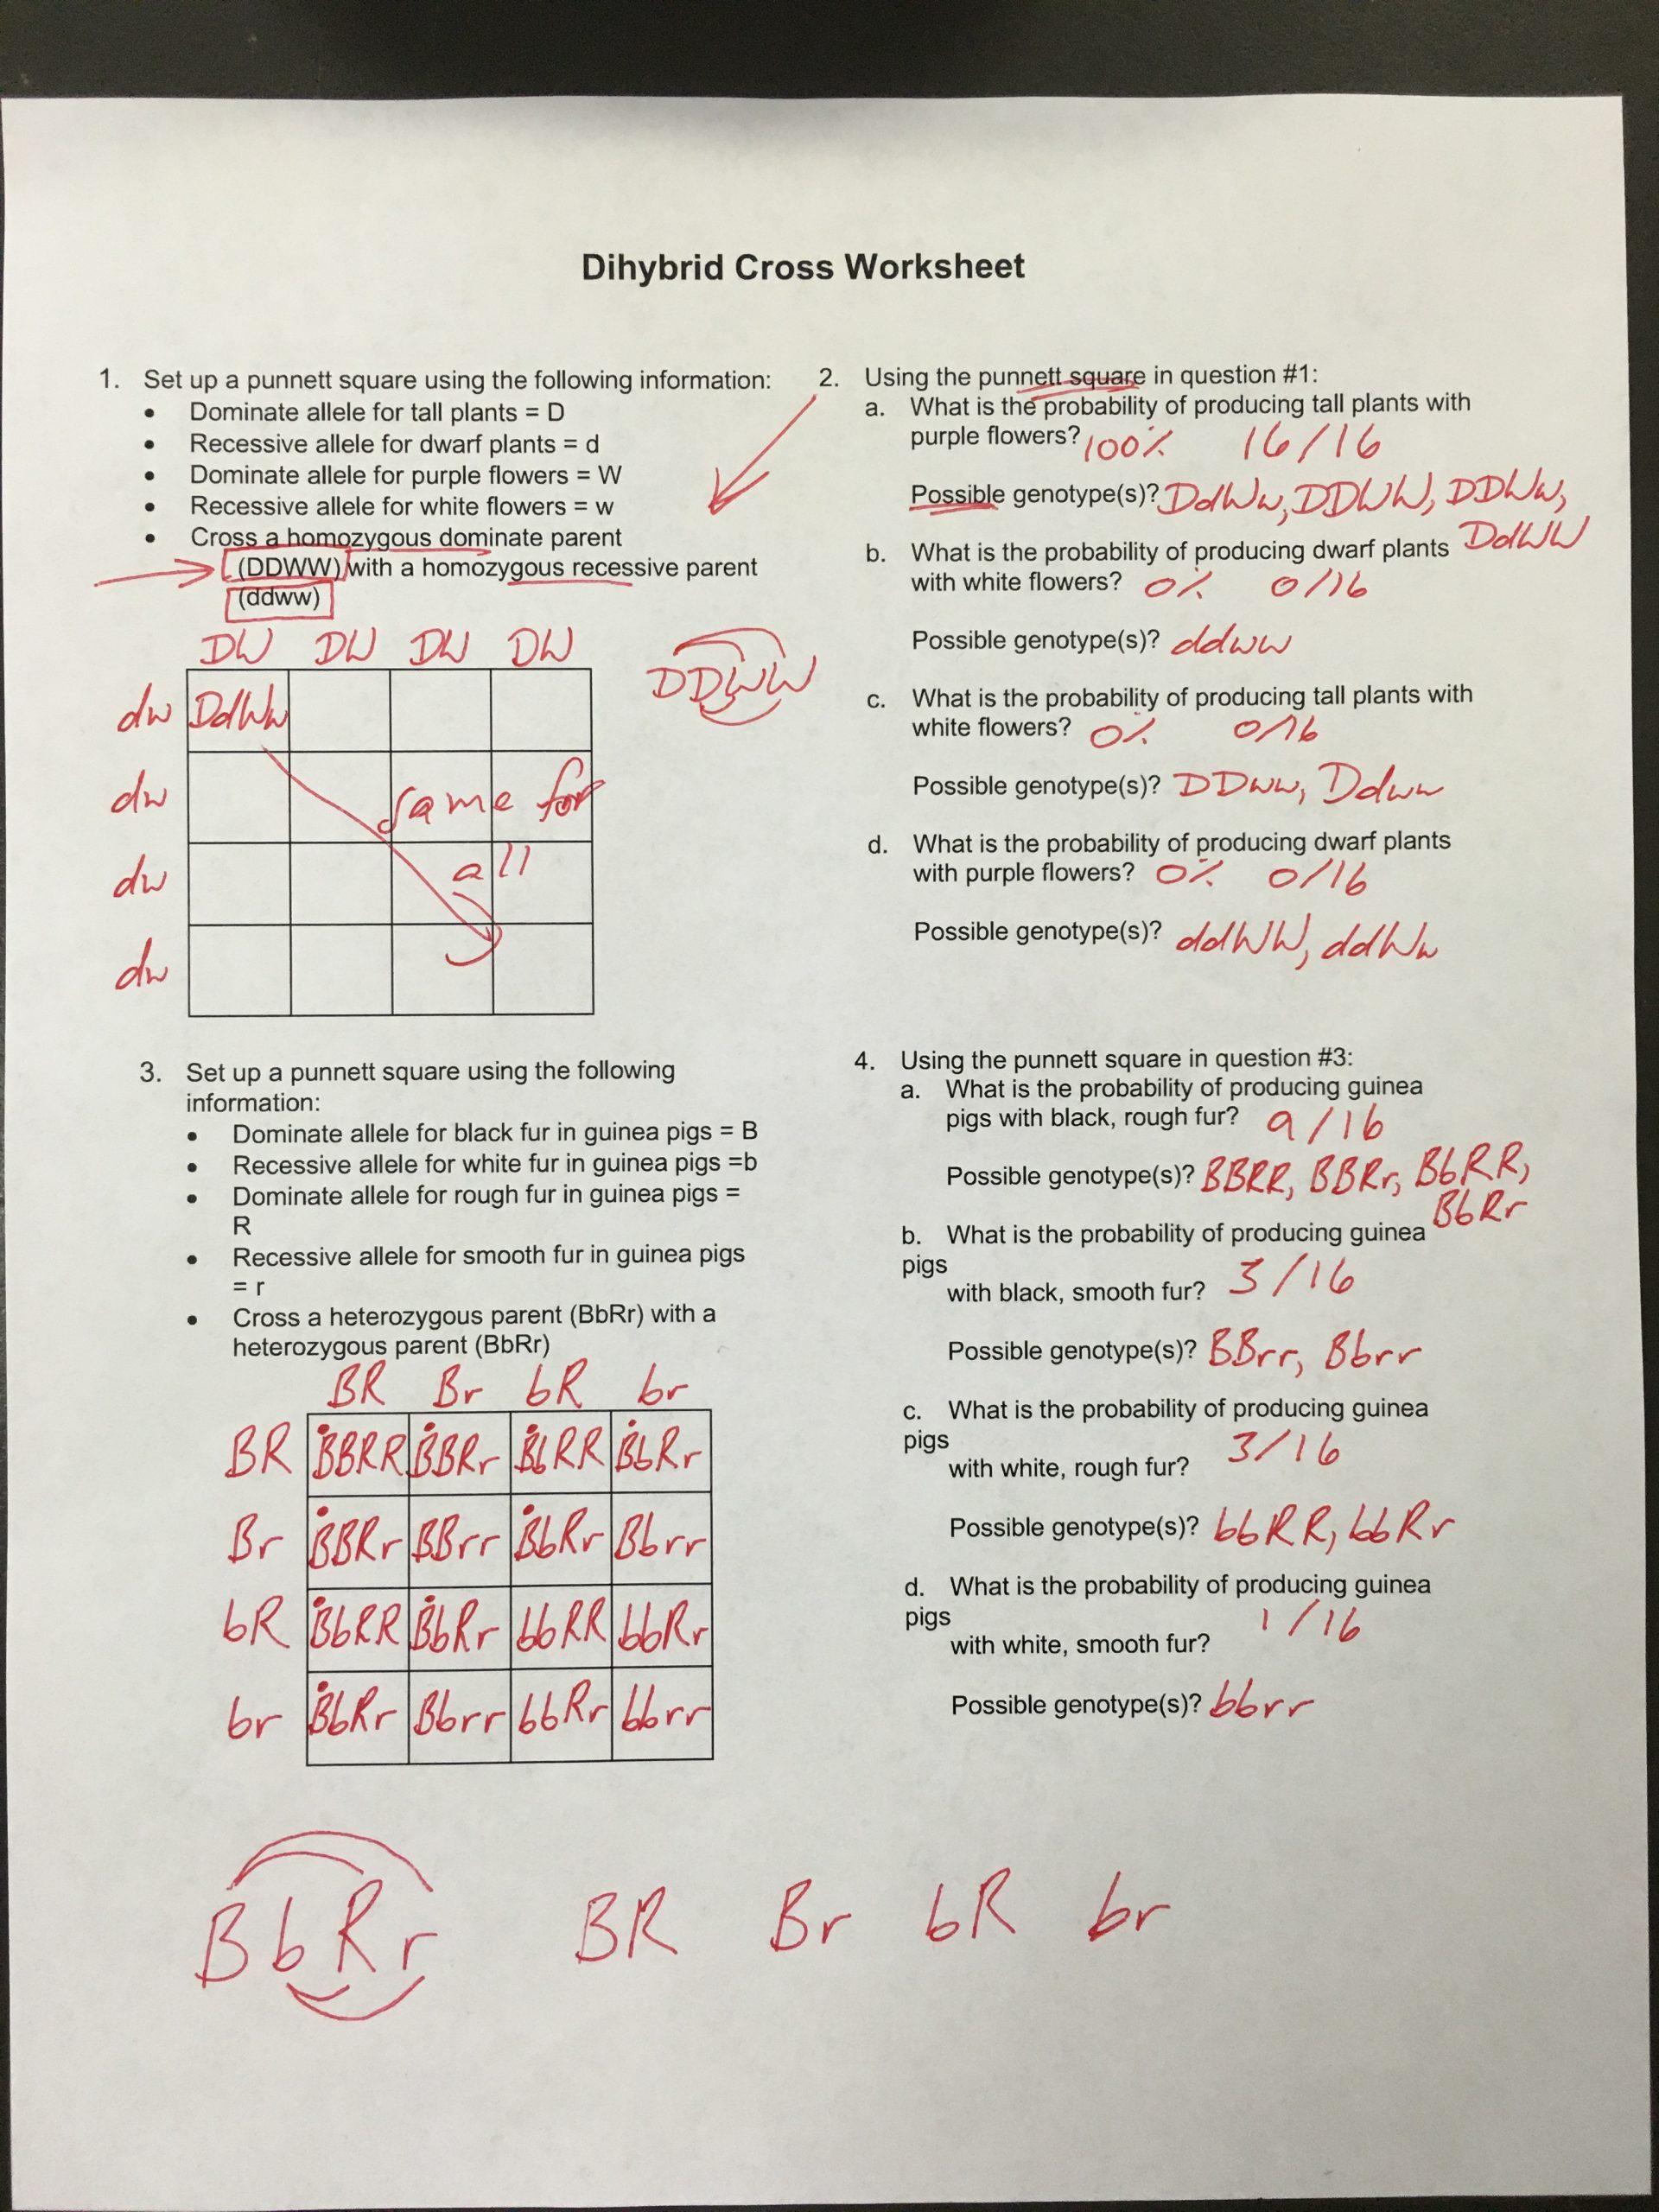 Genetics Practice Problems Worksheet Answers Worksheet Dihybrid Crosses Unit 3 Genetics Answer Key